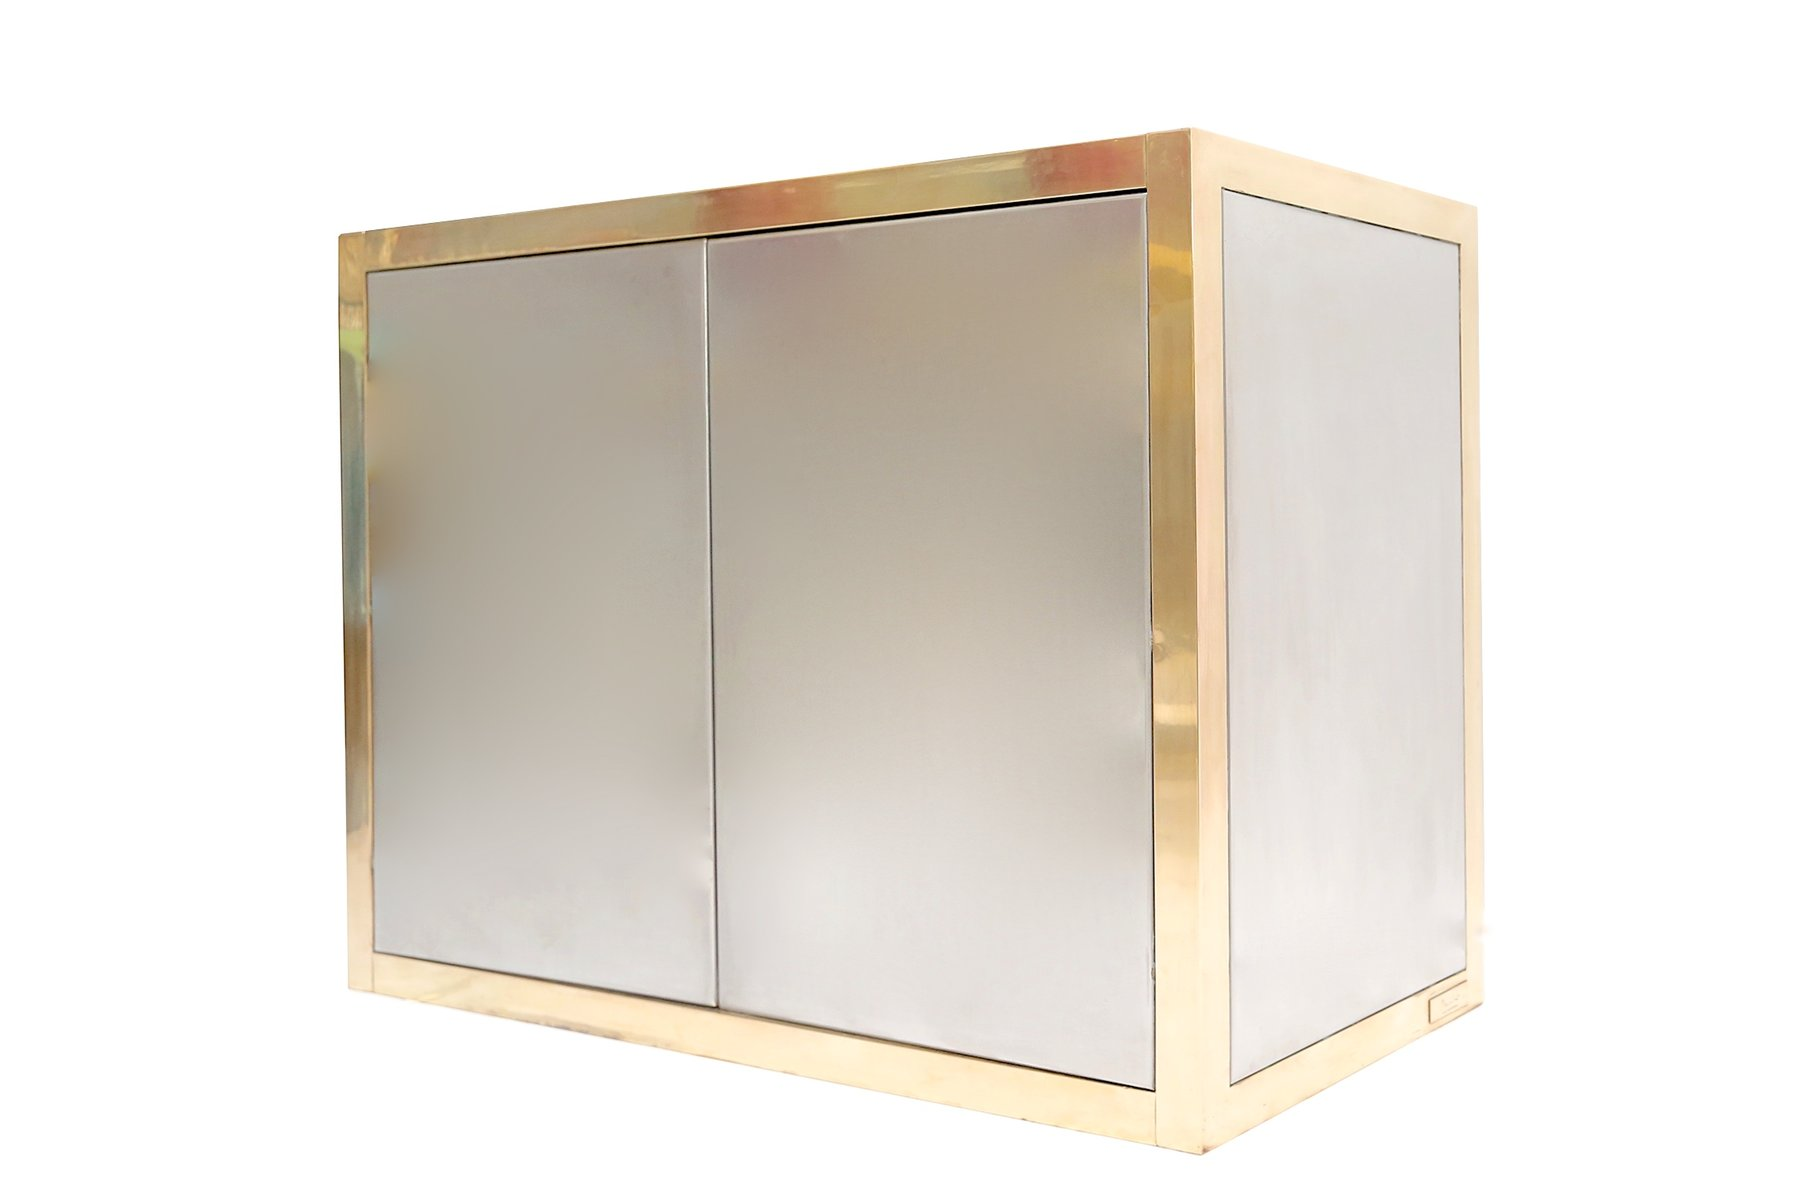 brass aluminum cabinet by axel vervoordt 1970s for sale. Black Bedroom Furniture Sets. Home Design Ideas